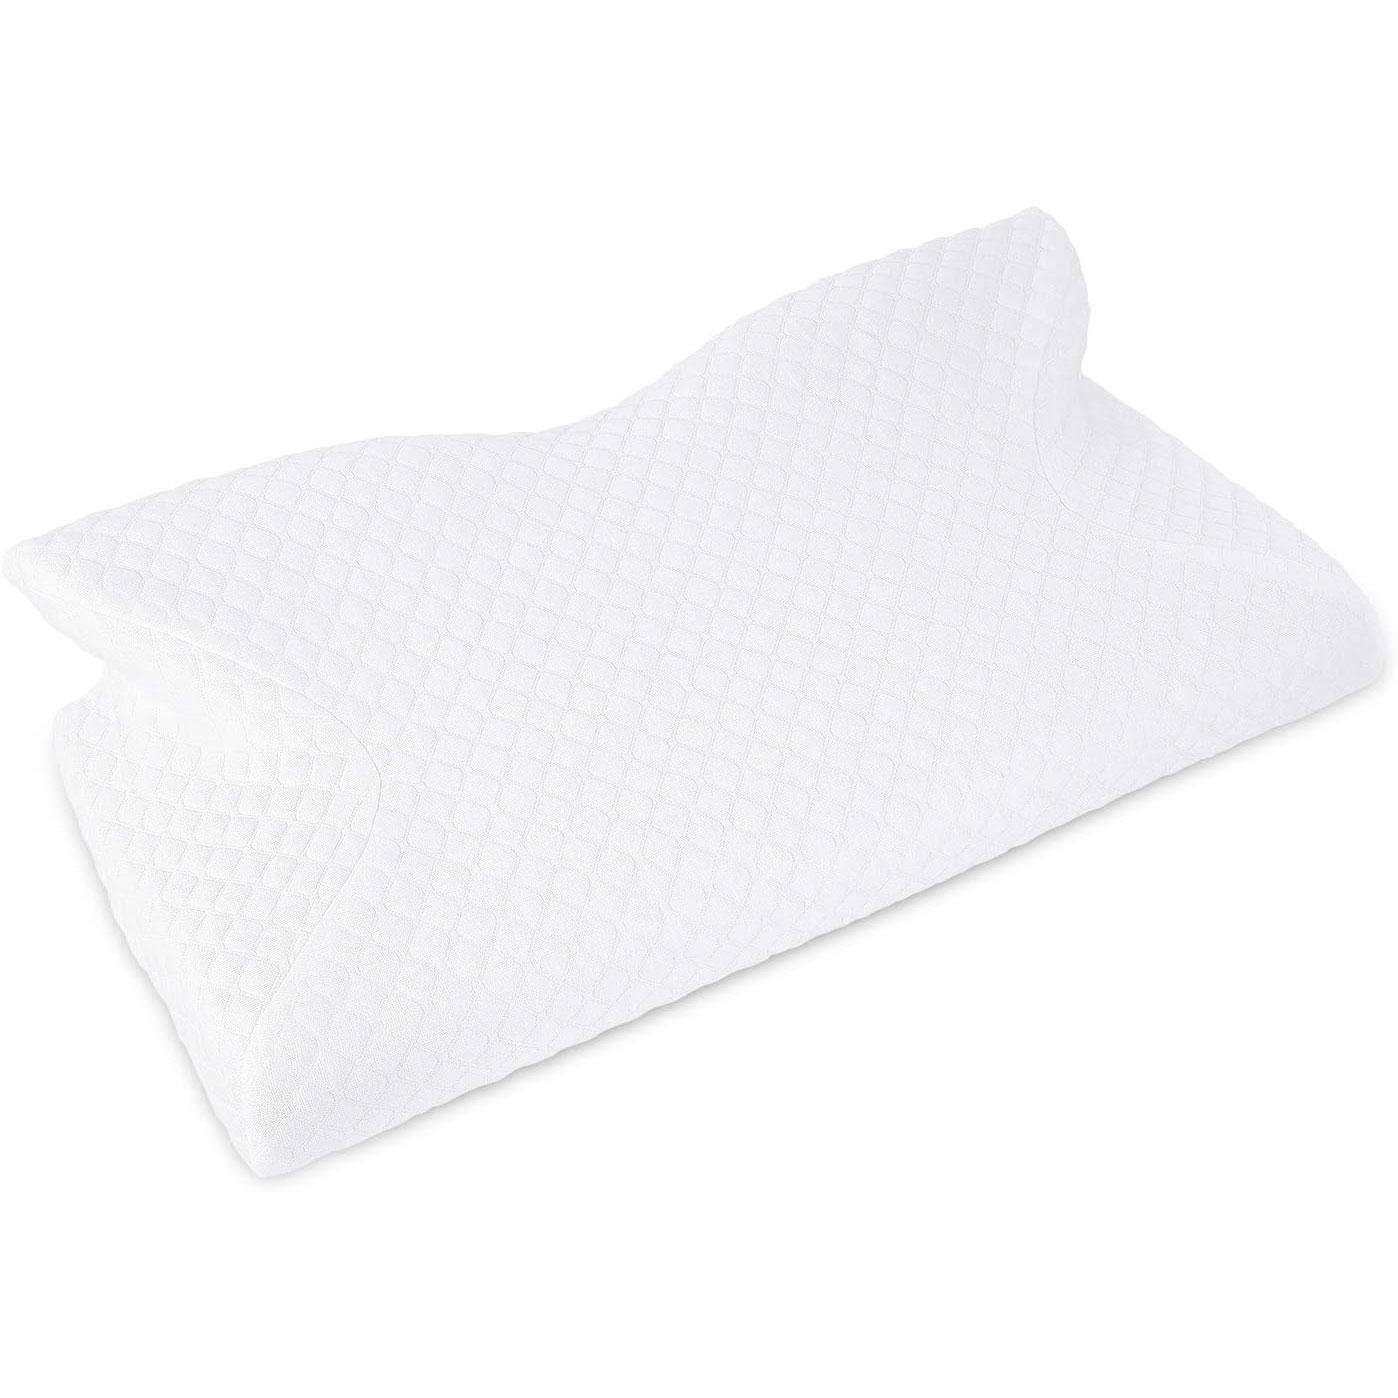 Amazon:Ergonomic Memory Foam Pillow只賣$18.04